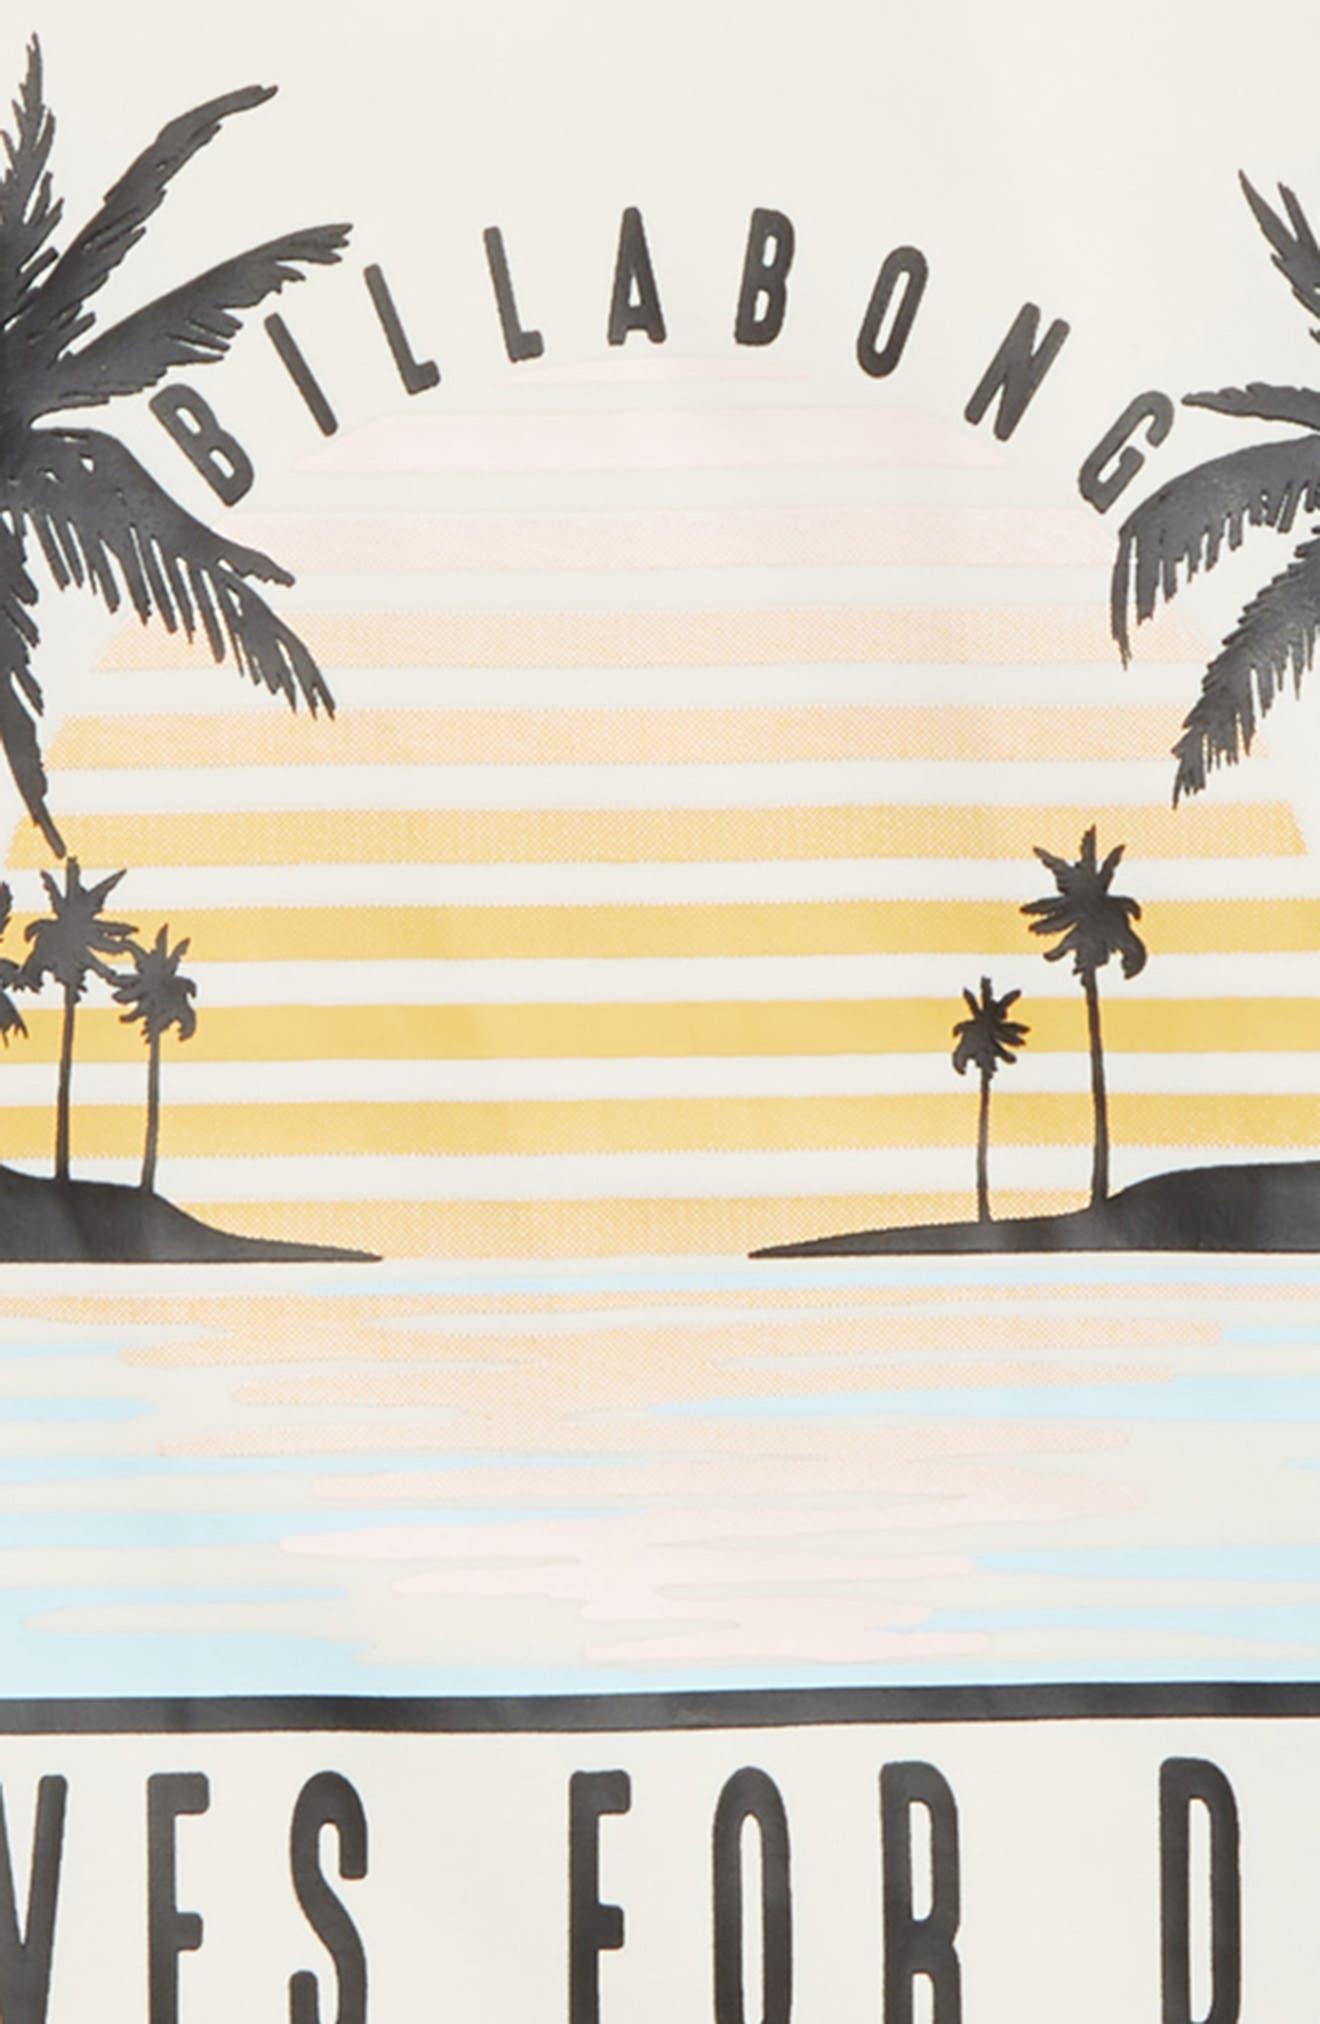 Waves for Days Long Sleeve Rashguard,                             Alternate thumbnail 2, color,                             BLACK PEBBLE